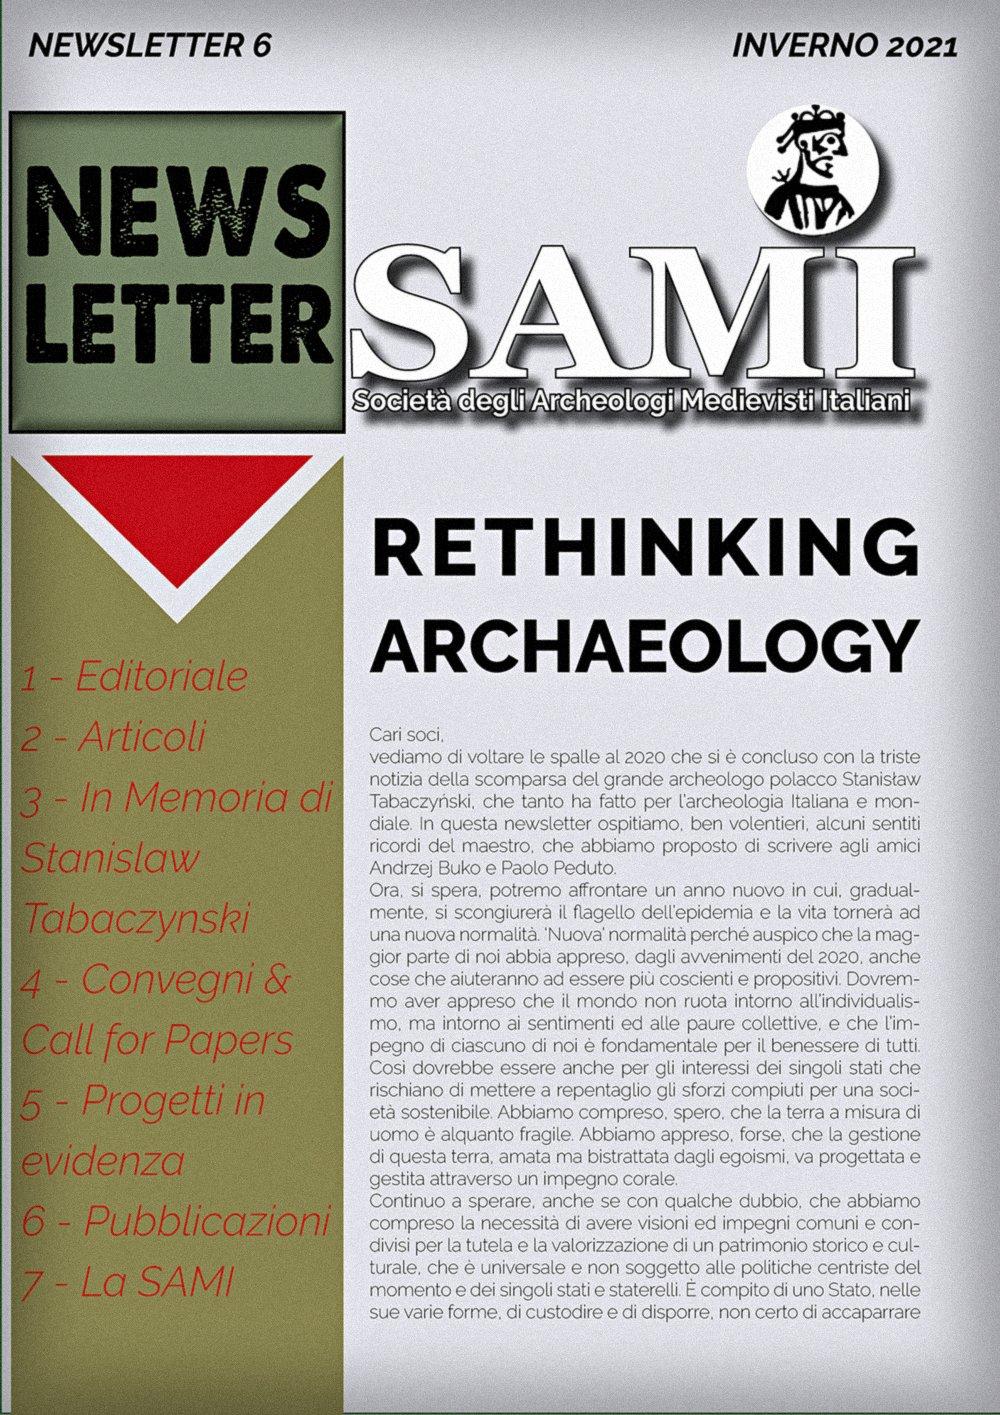 SAMI Newsletter - Febbraio 2021, immagine.